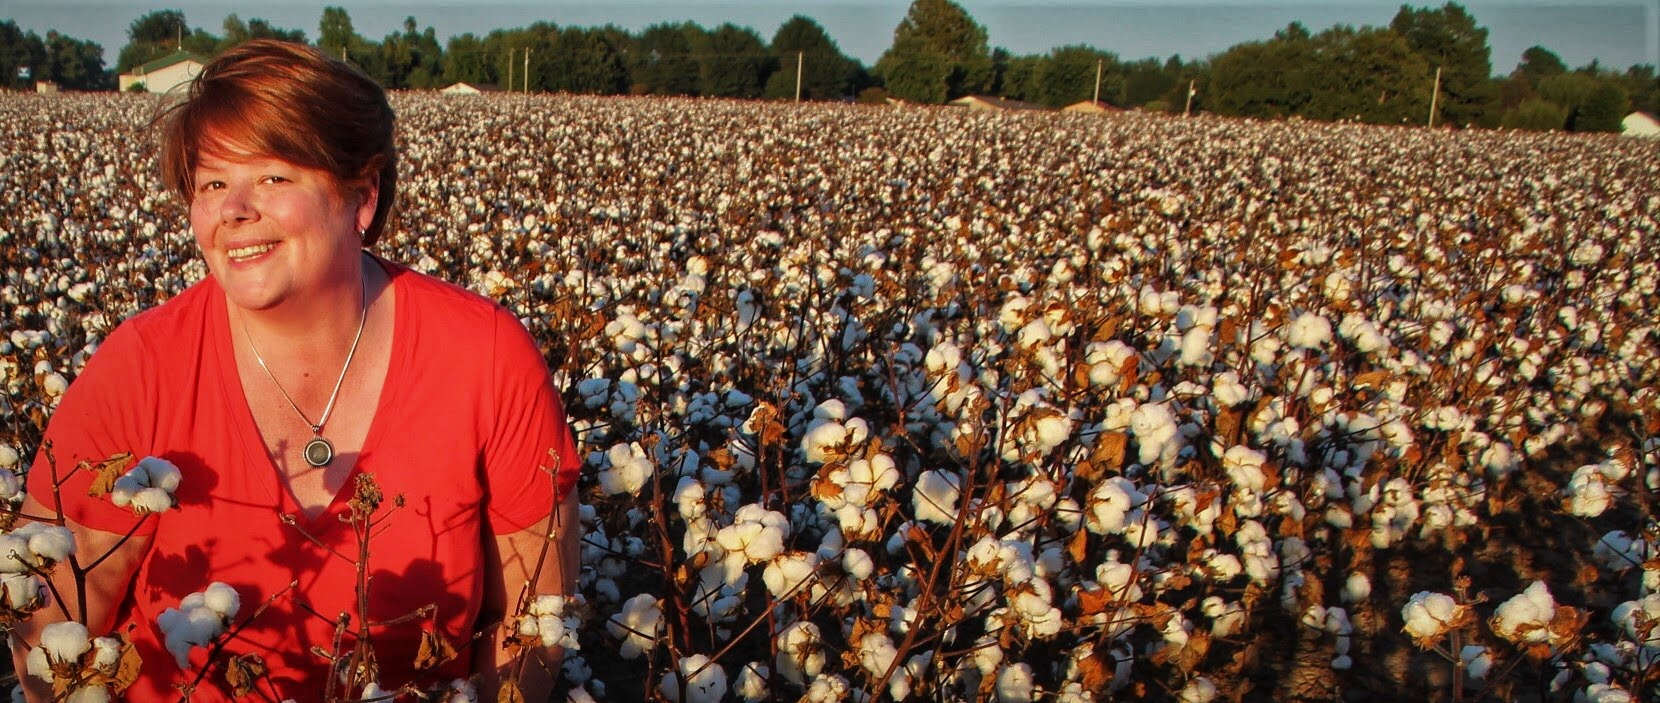 founder hundred percent cotton